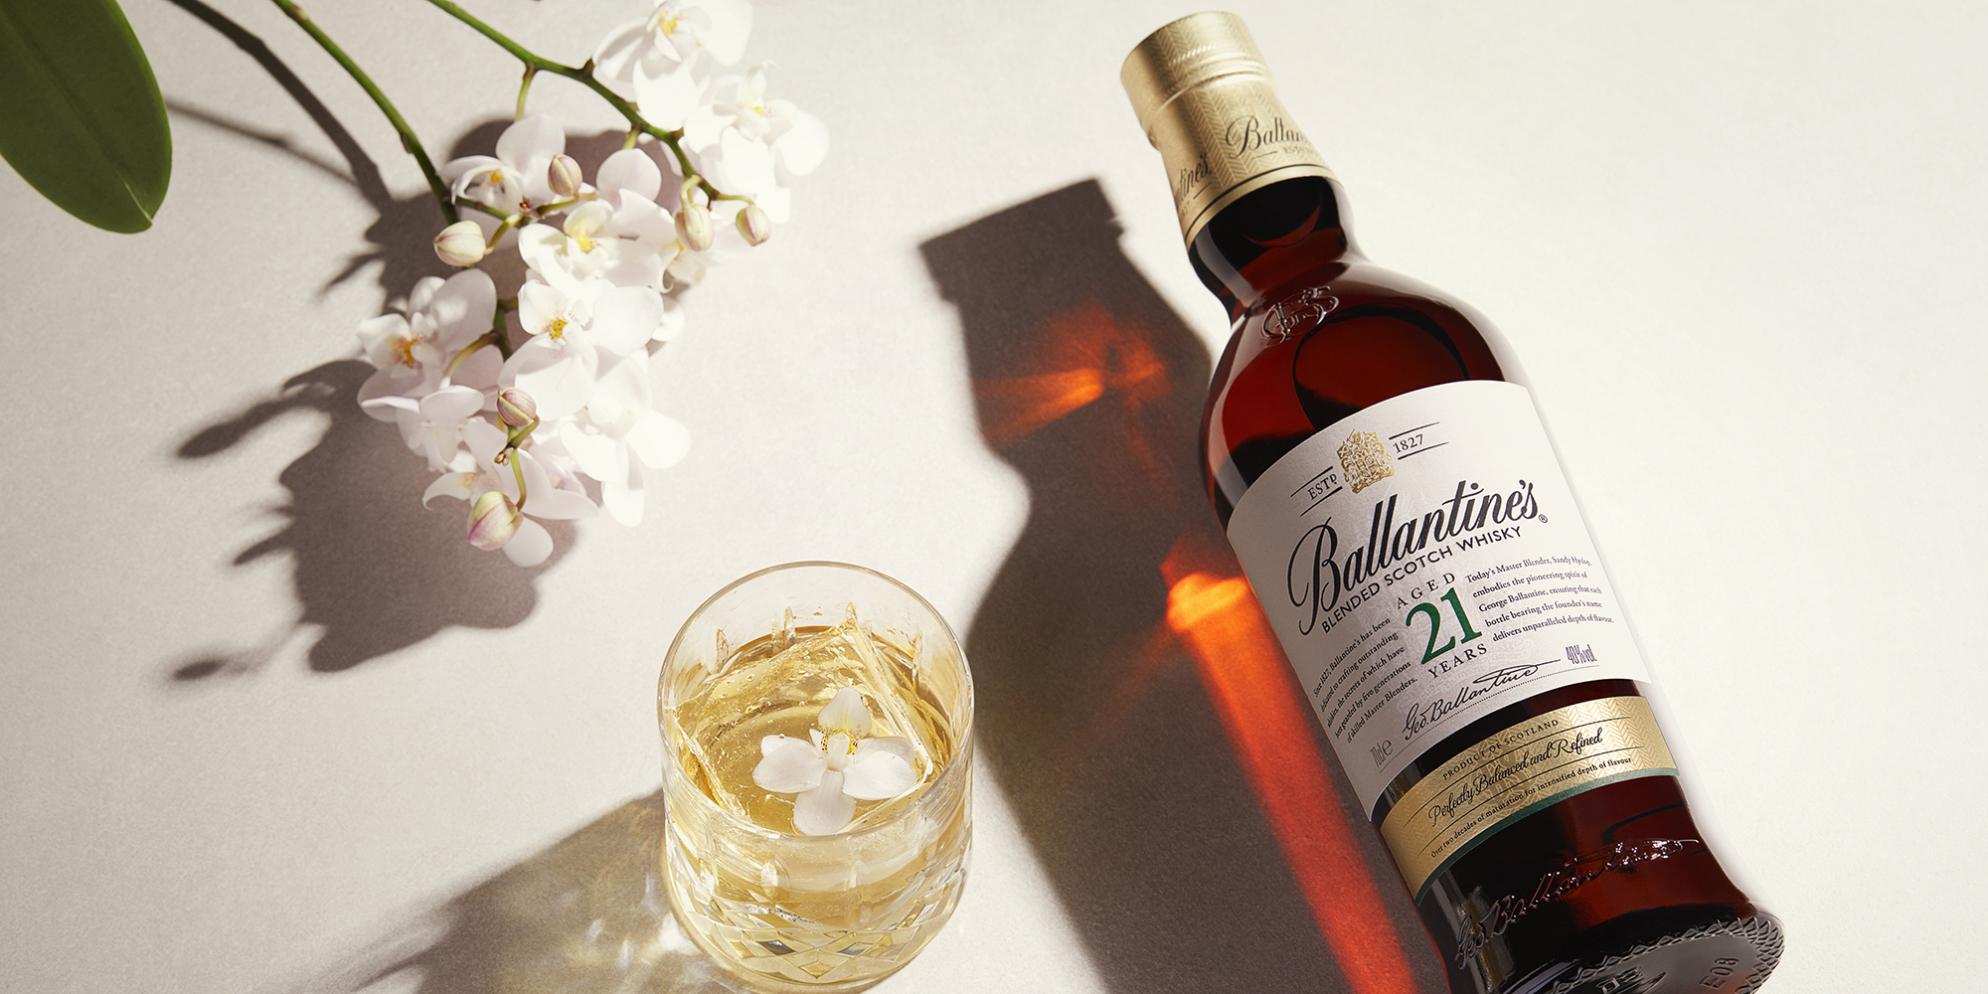 Ballantine's 21 Whisky Cocktails | White Orchid | Prestige | Ballantine's